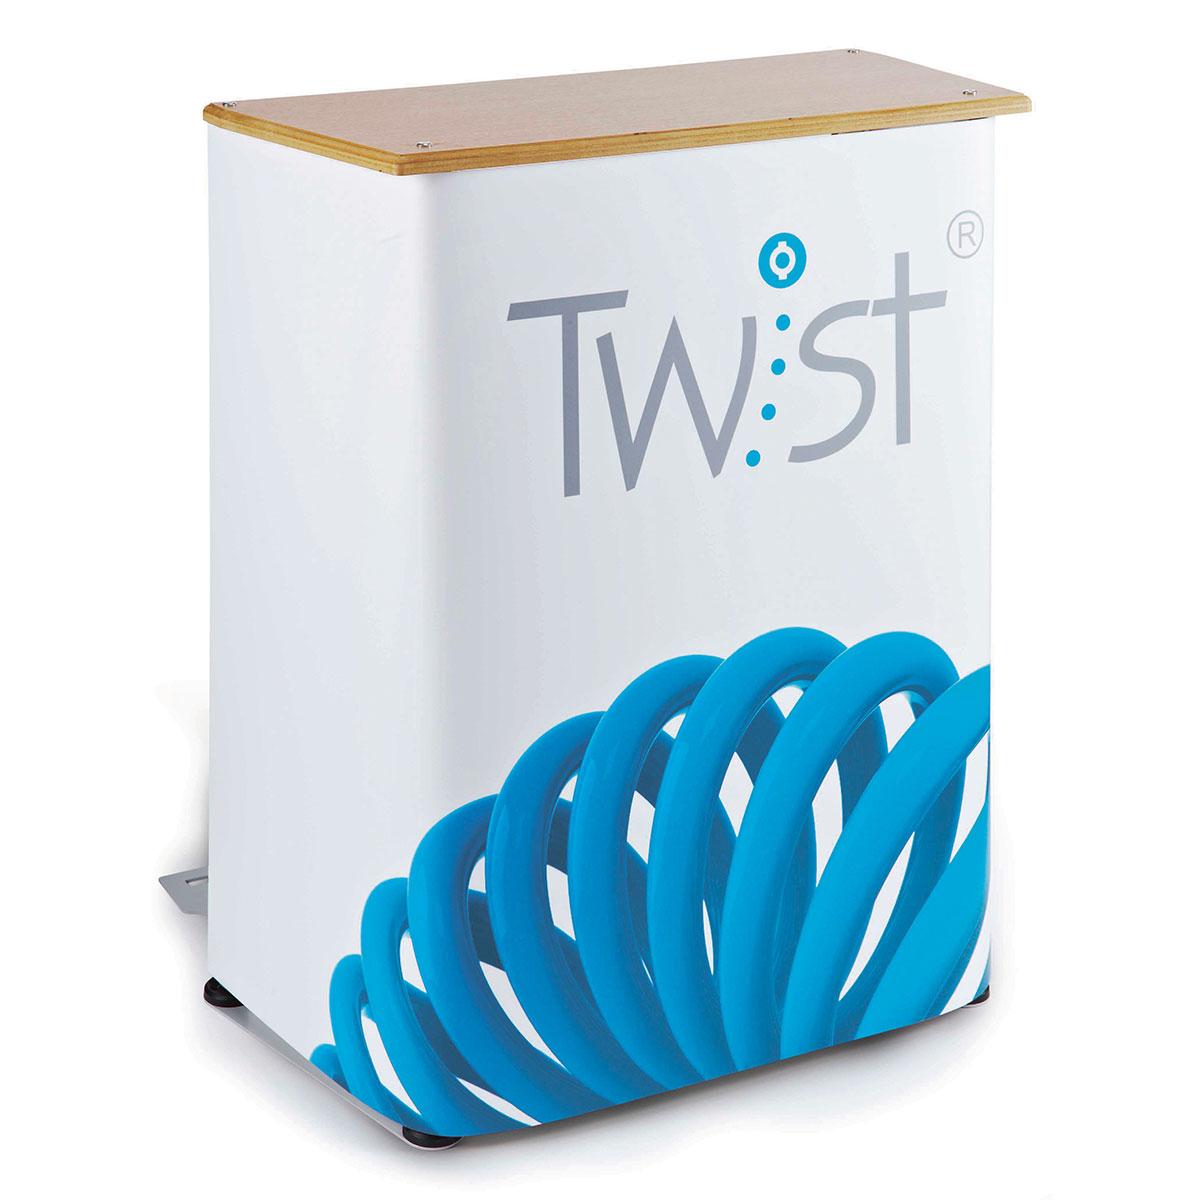 Twist Desk